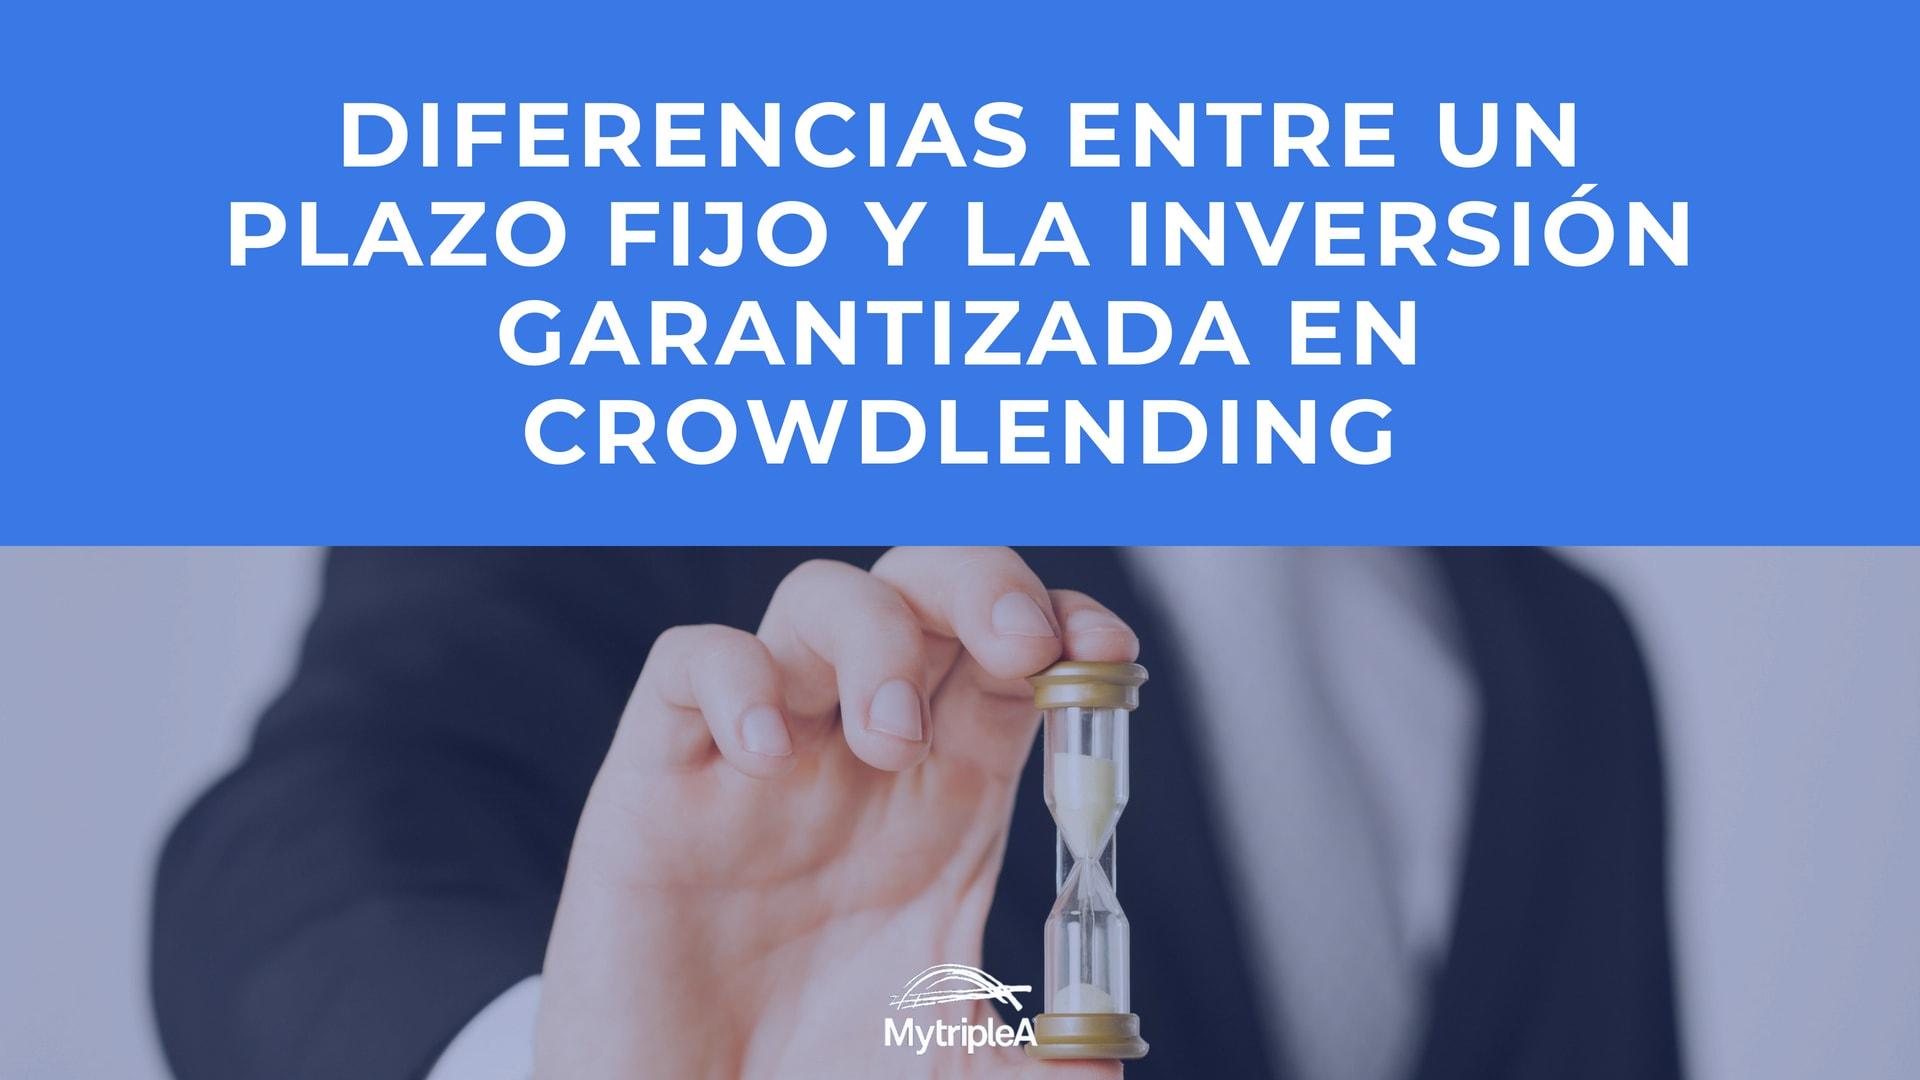 plazo_fijo_crowdlending.jpg